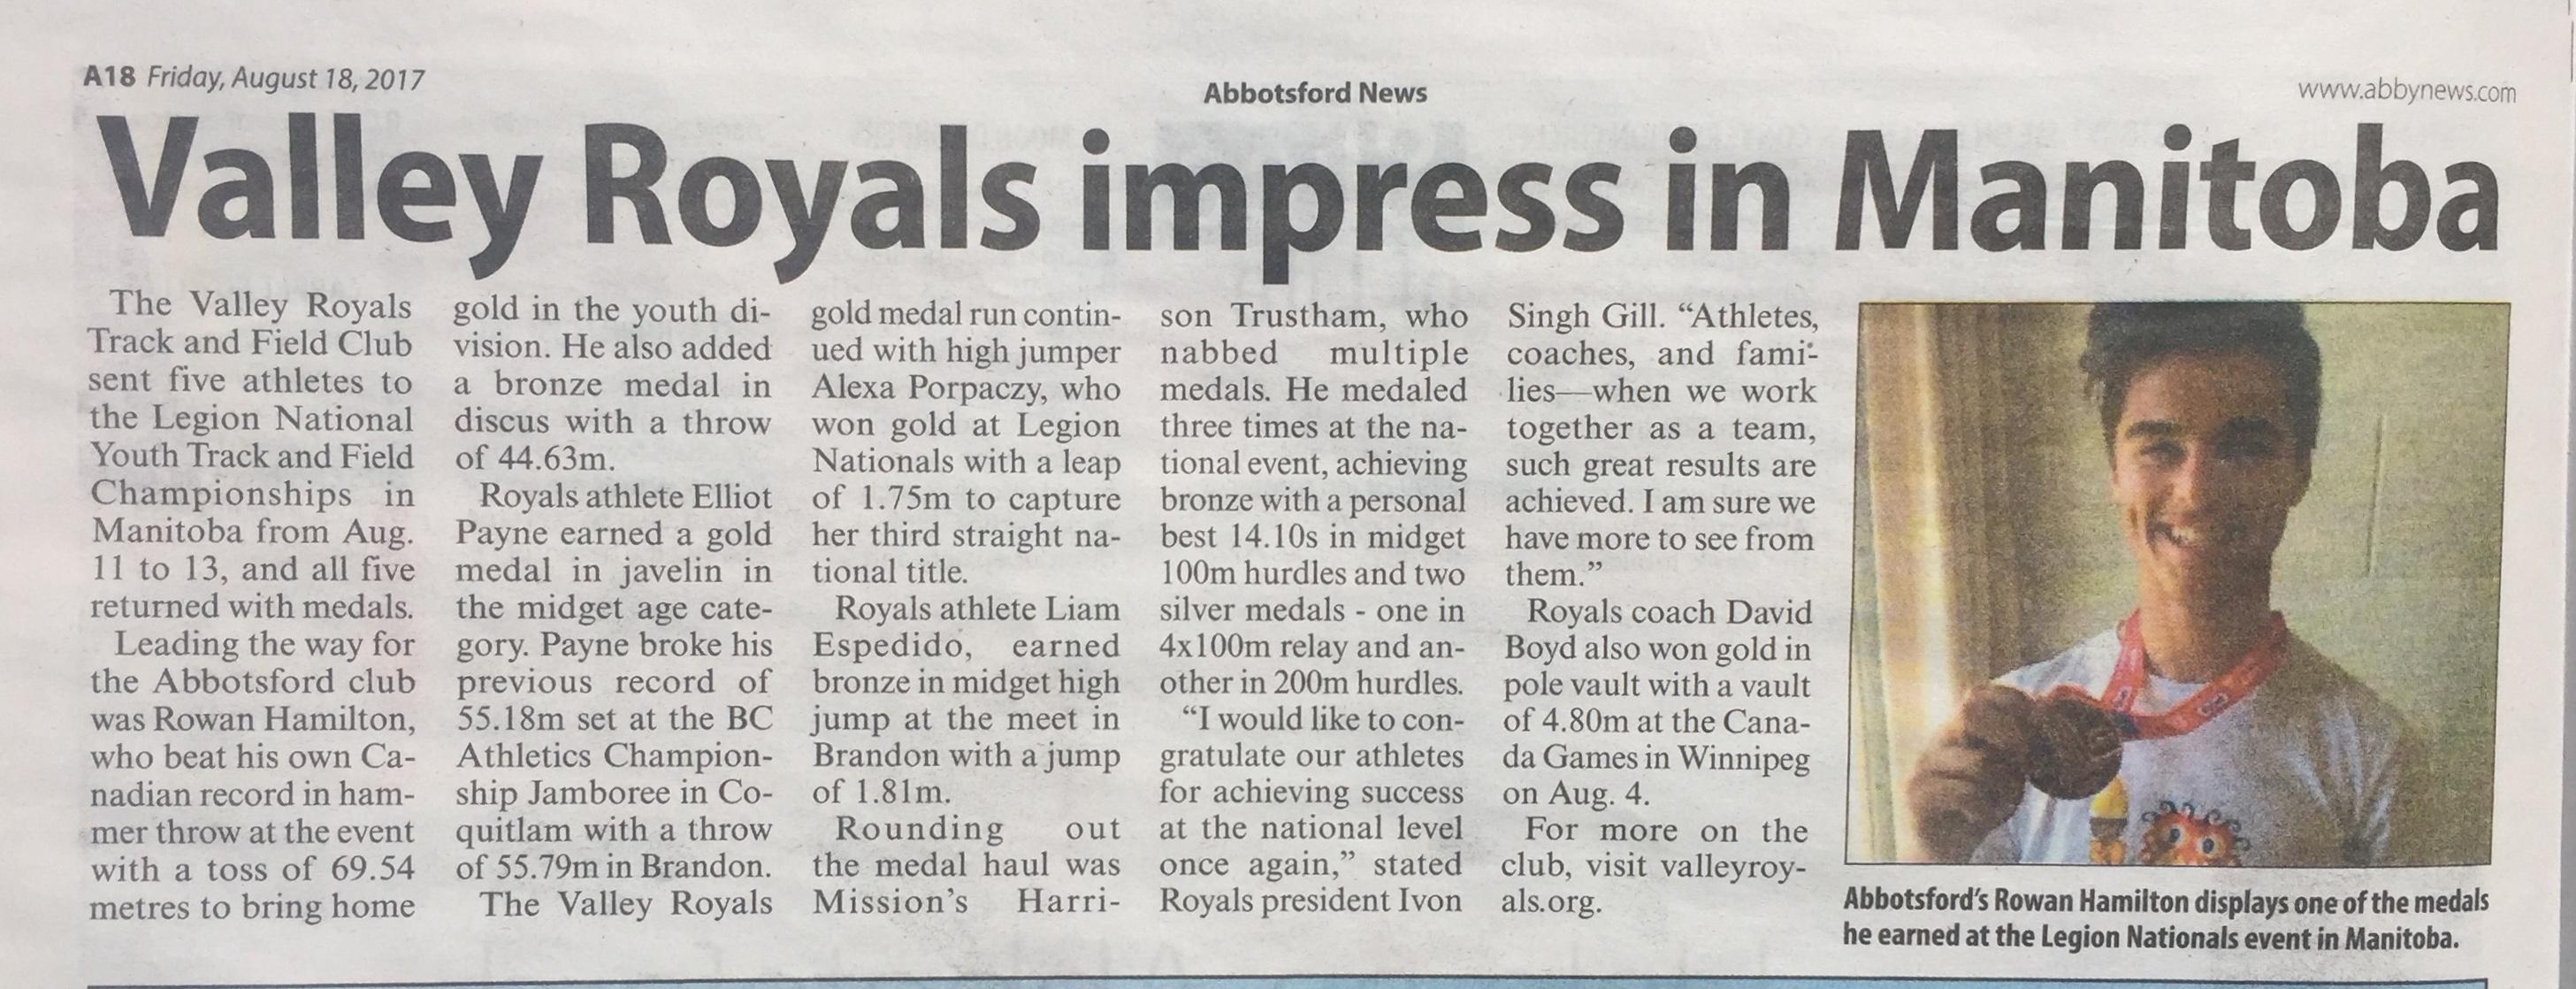 Valley Royals Perfect at Nationals! – Valley Royals Track